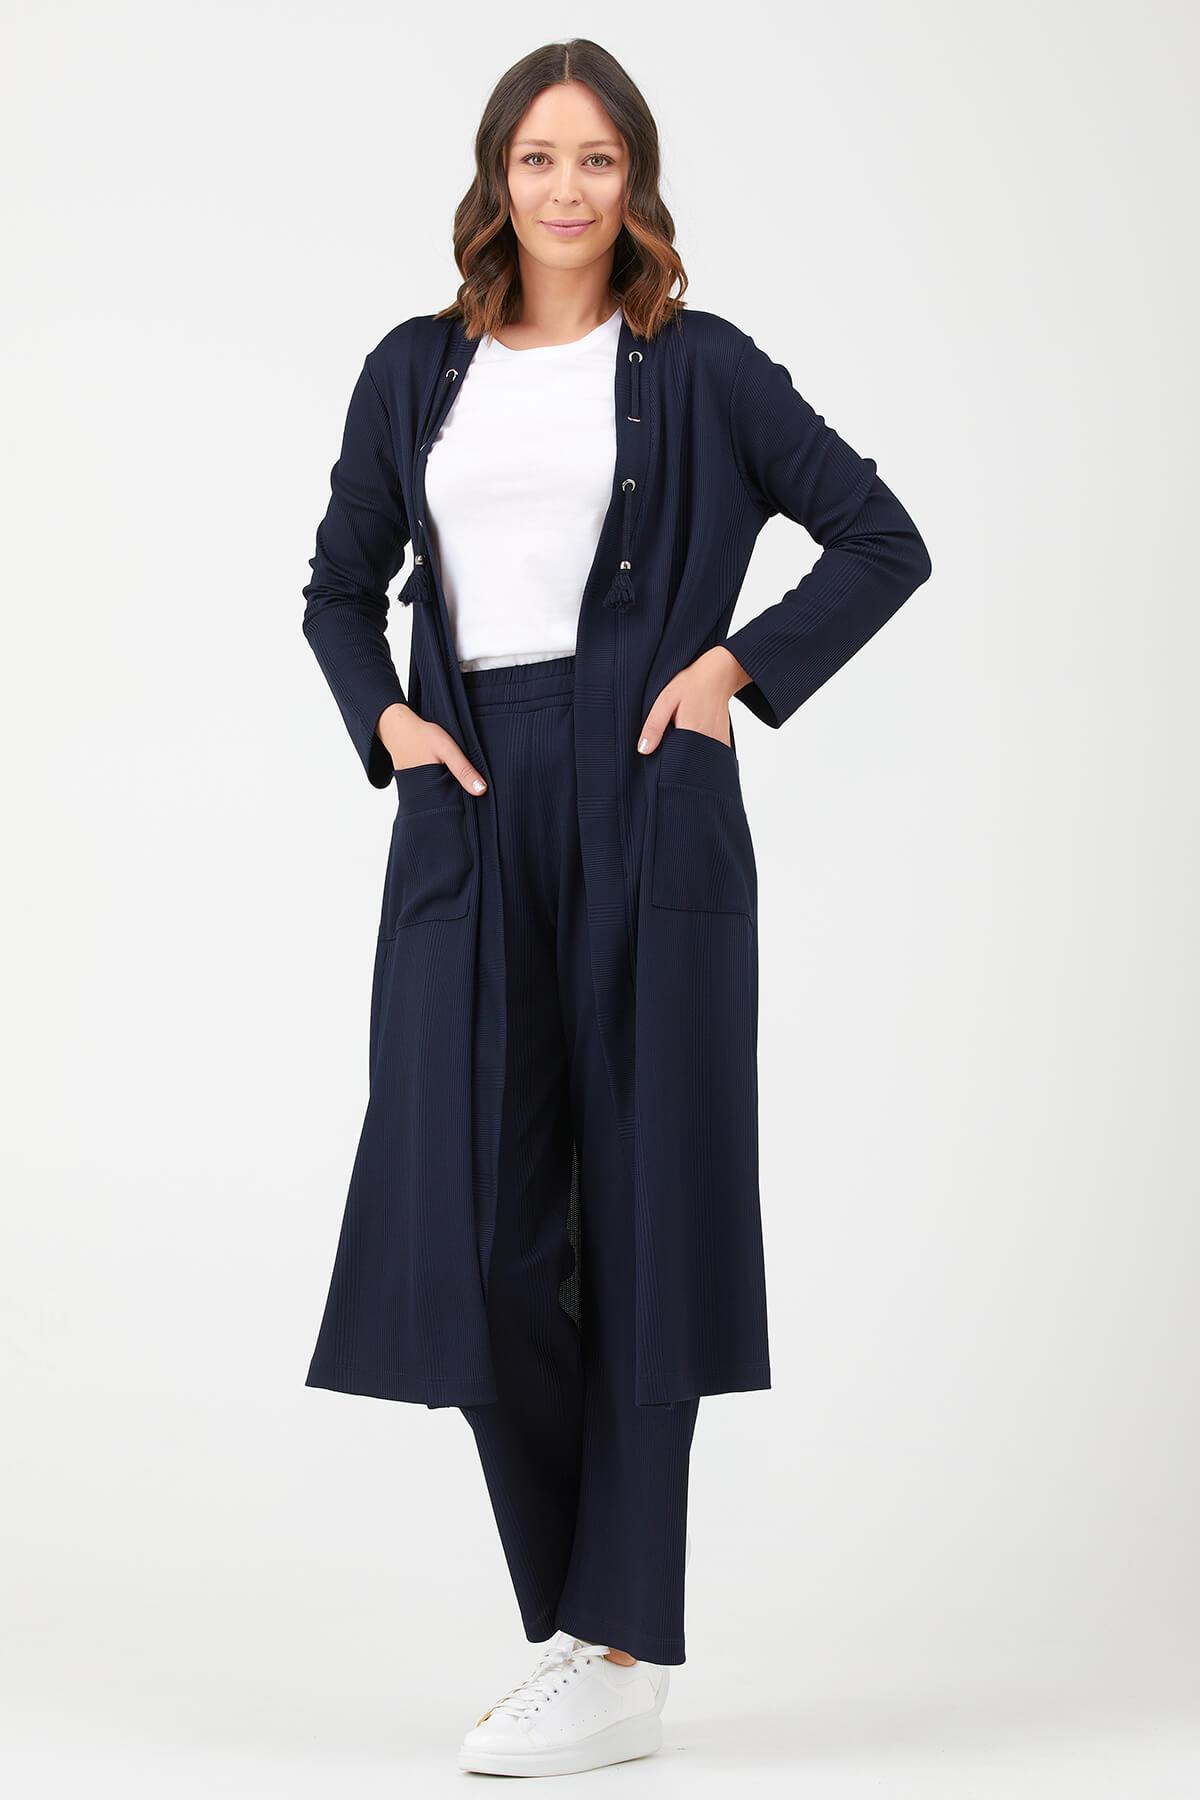 Suit Sementa Navy Blue